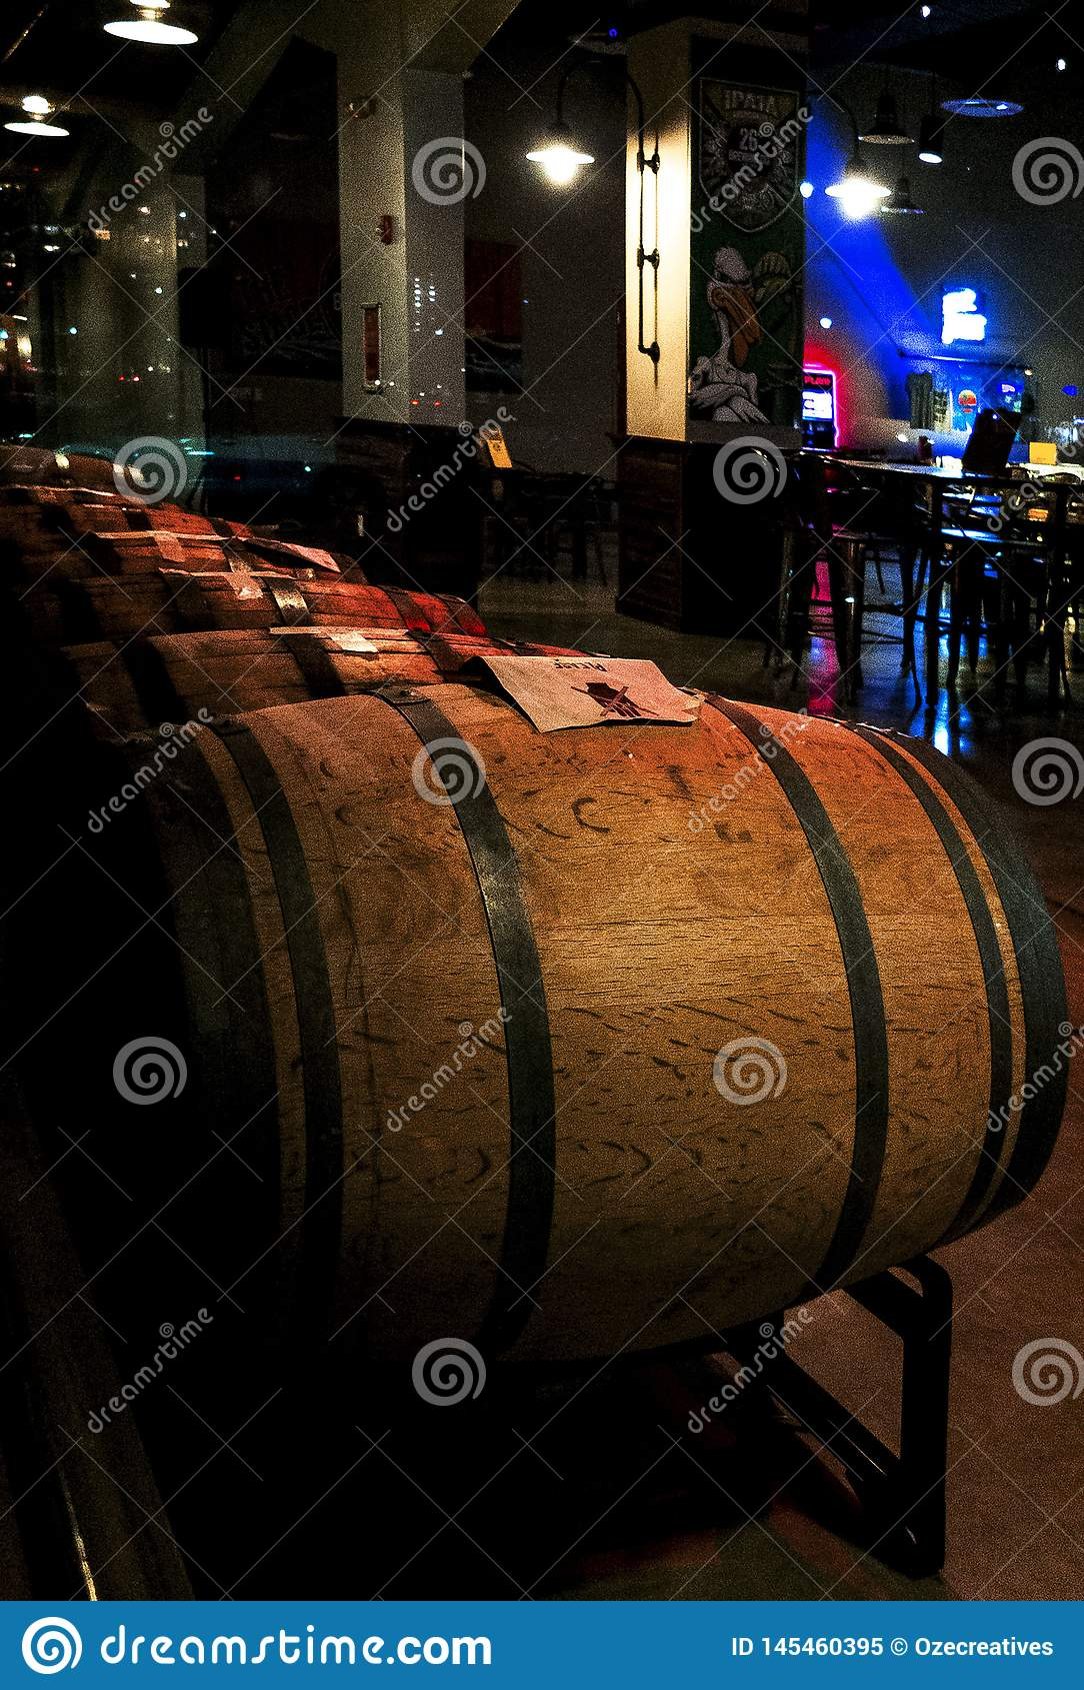 Bier-Brauerei-Holz rast in Folge gestapelt